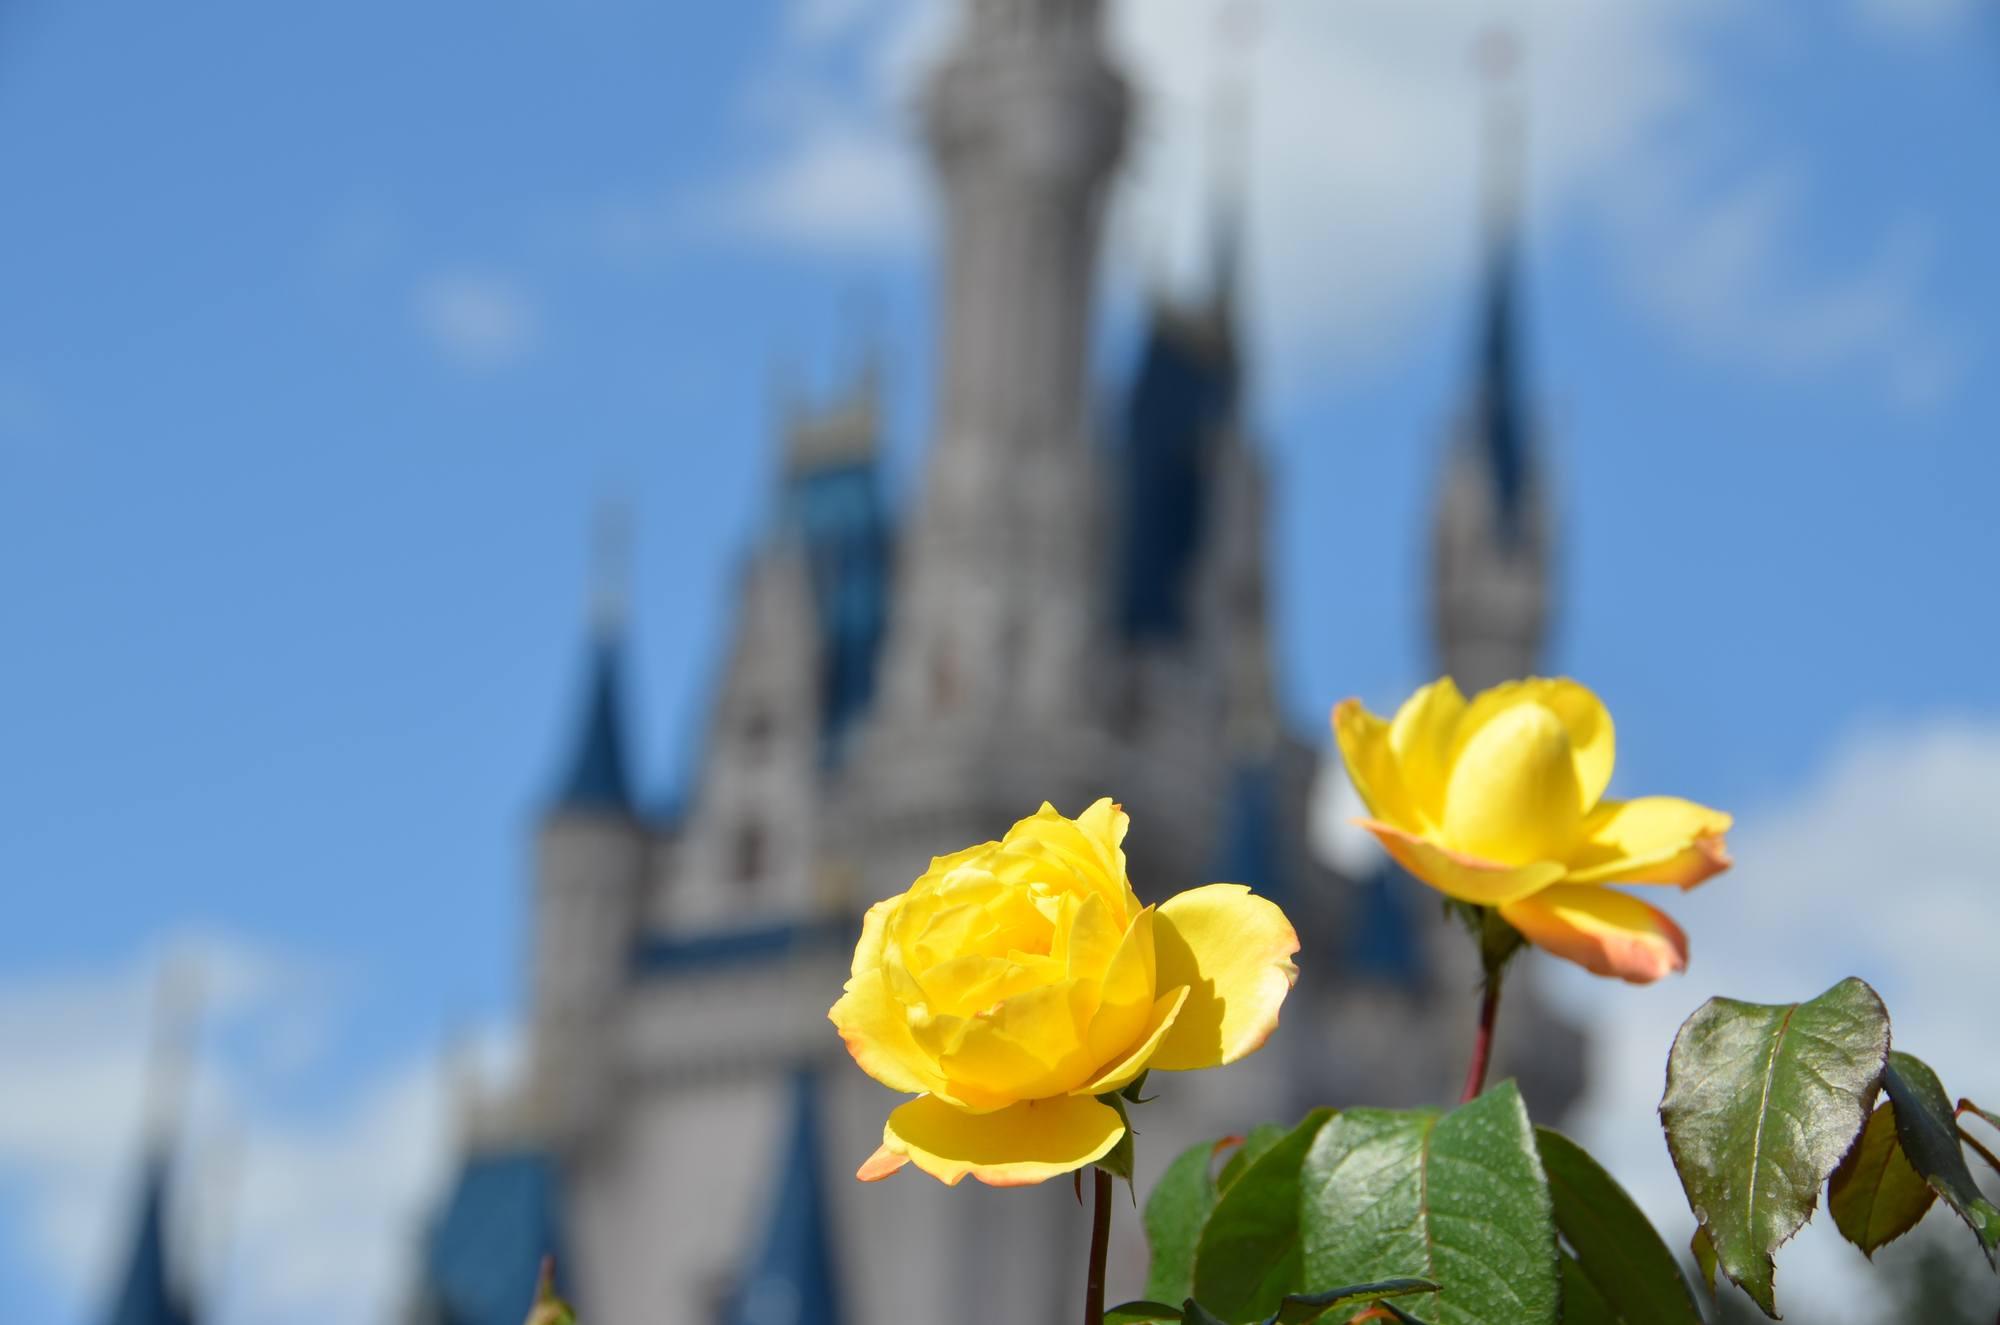 Cinderella Castle, the icon of Magic Kingdom Park at Walt Disney World Resort